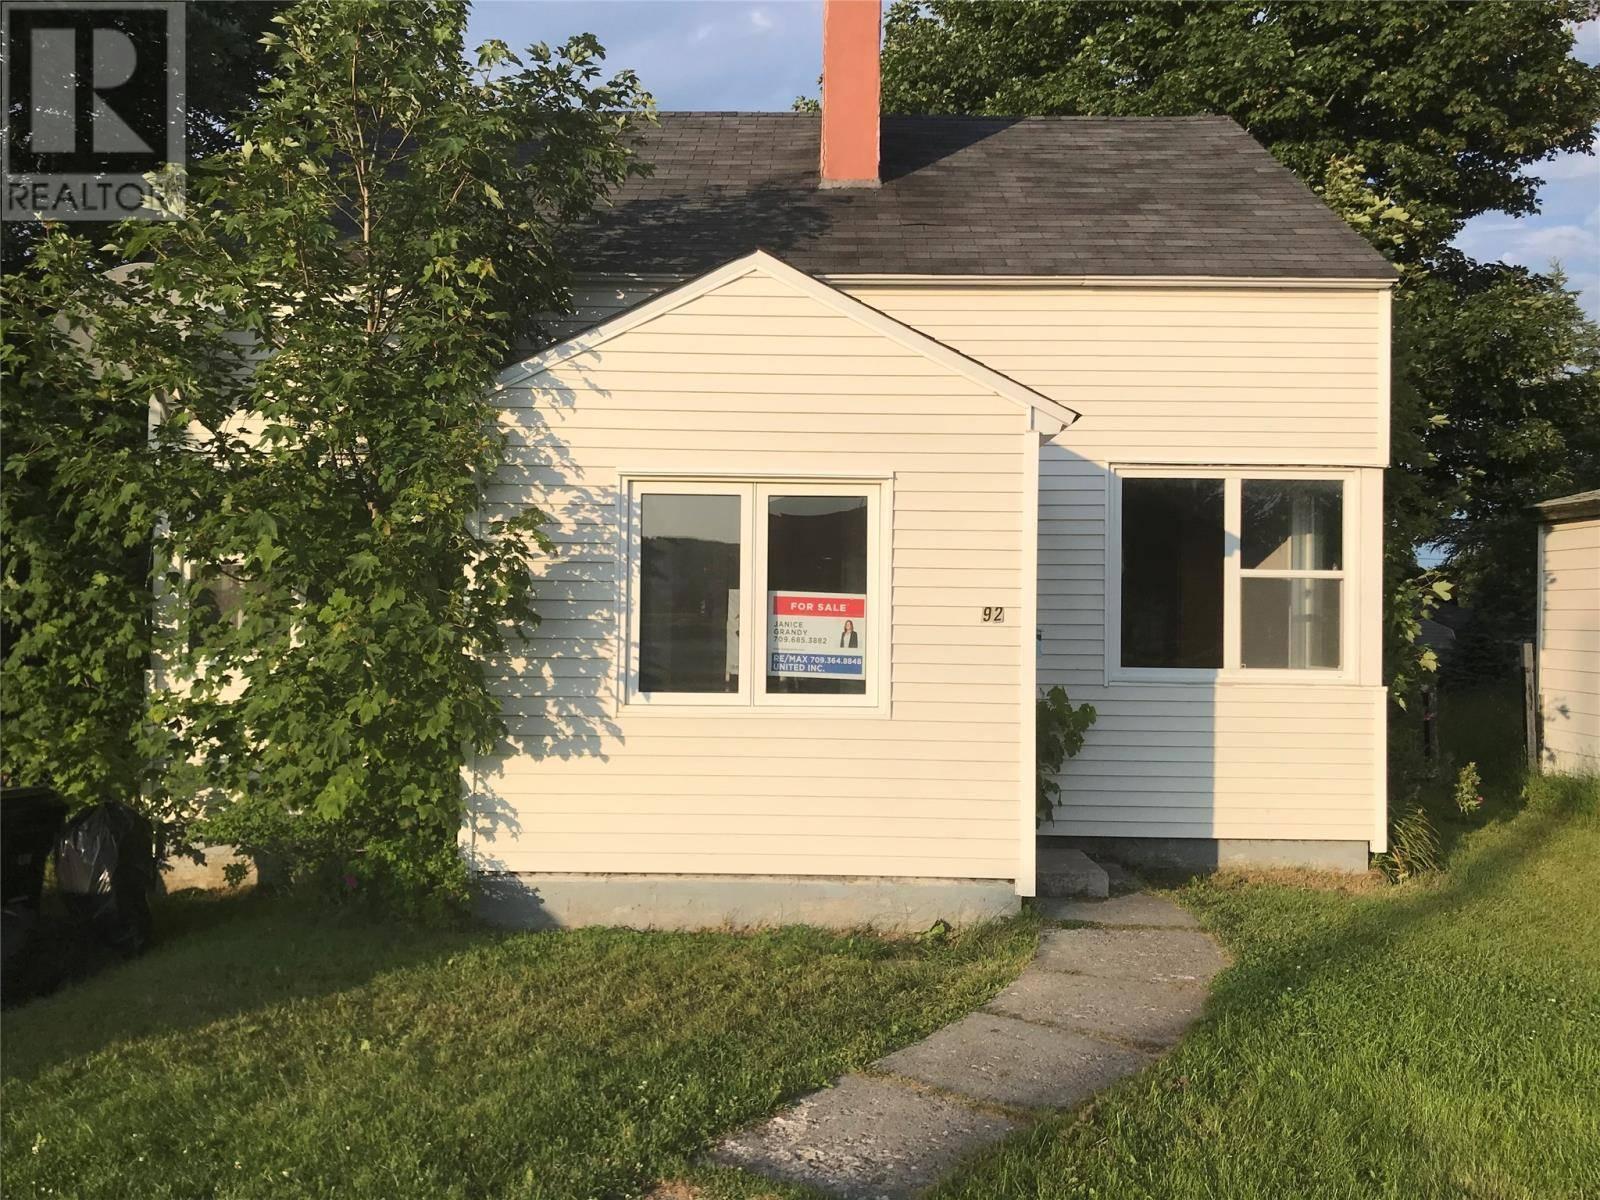 House for sale at 92 Allandale Rd St. John's Newfoundland - MLS: 1200017